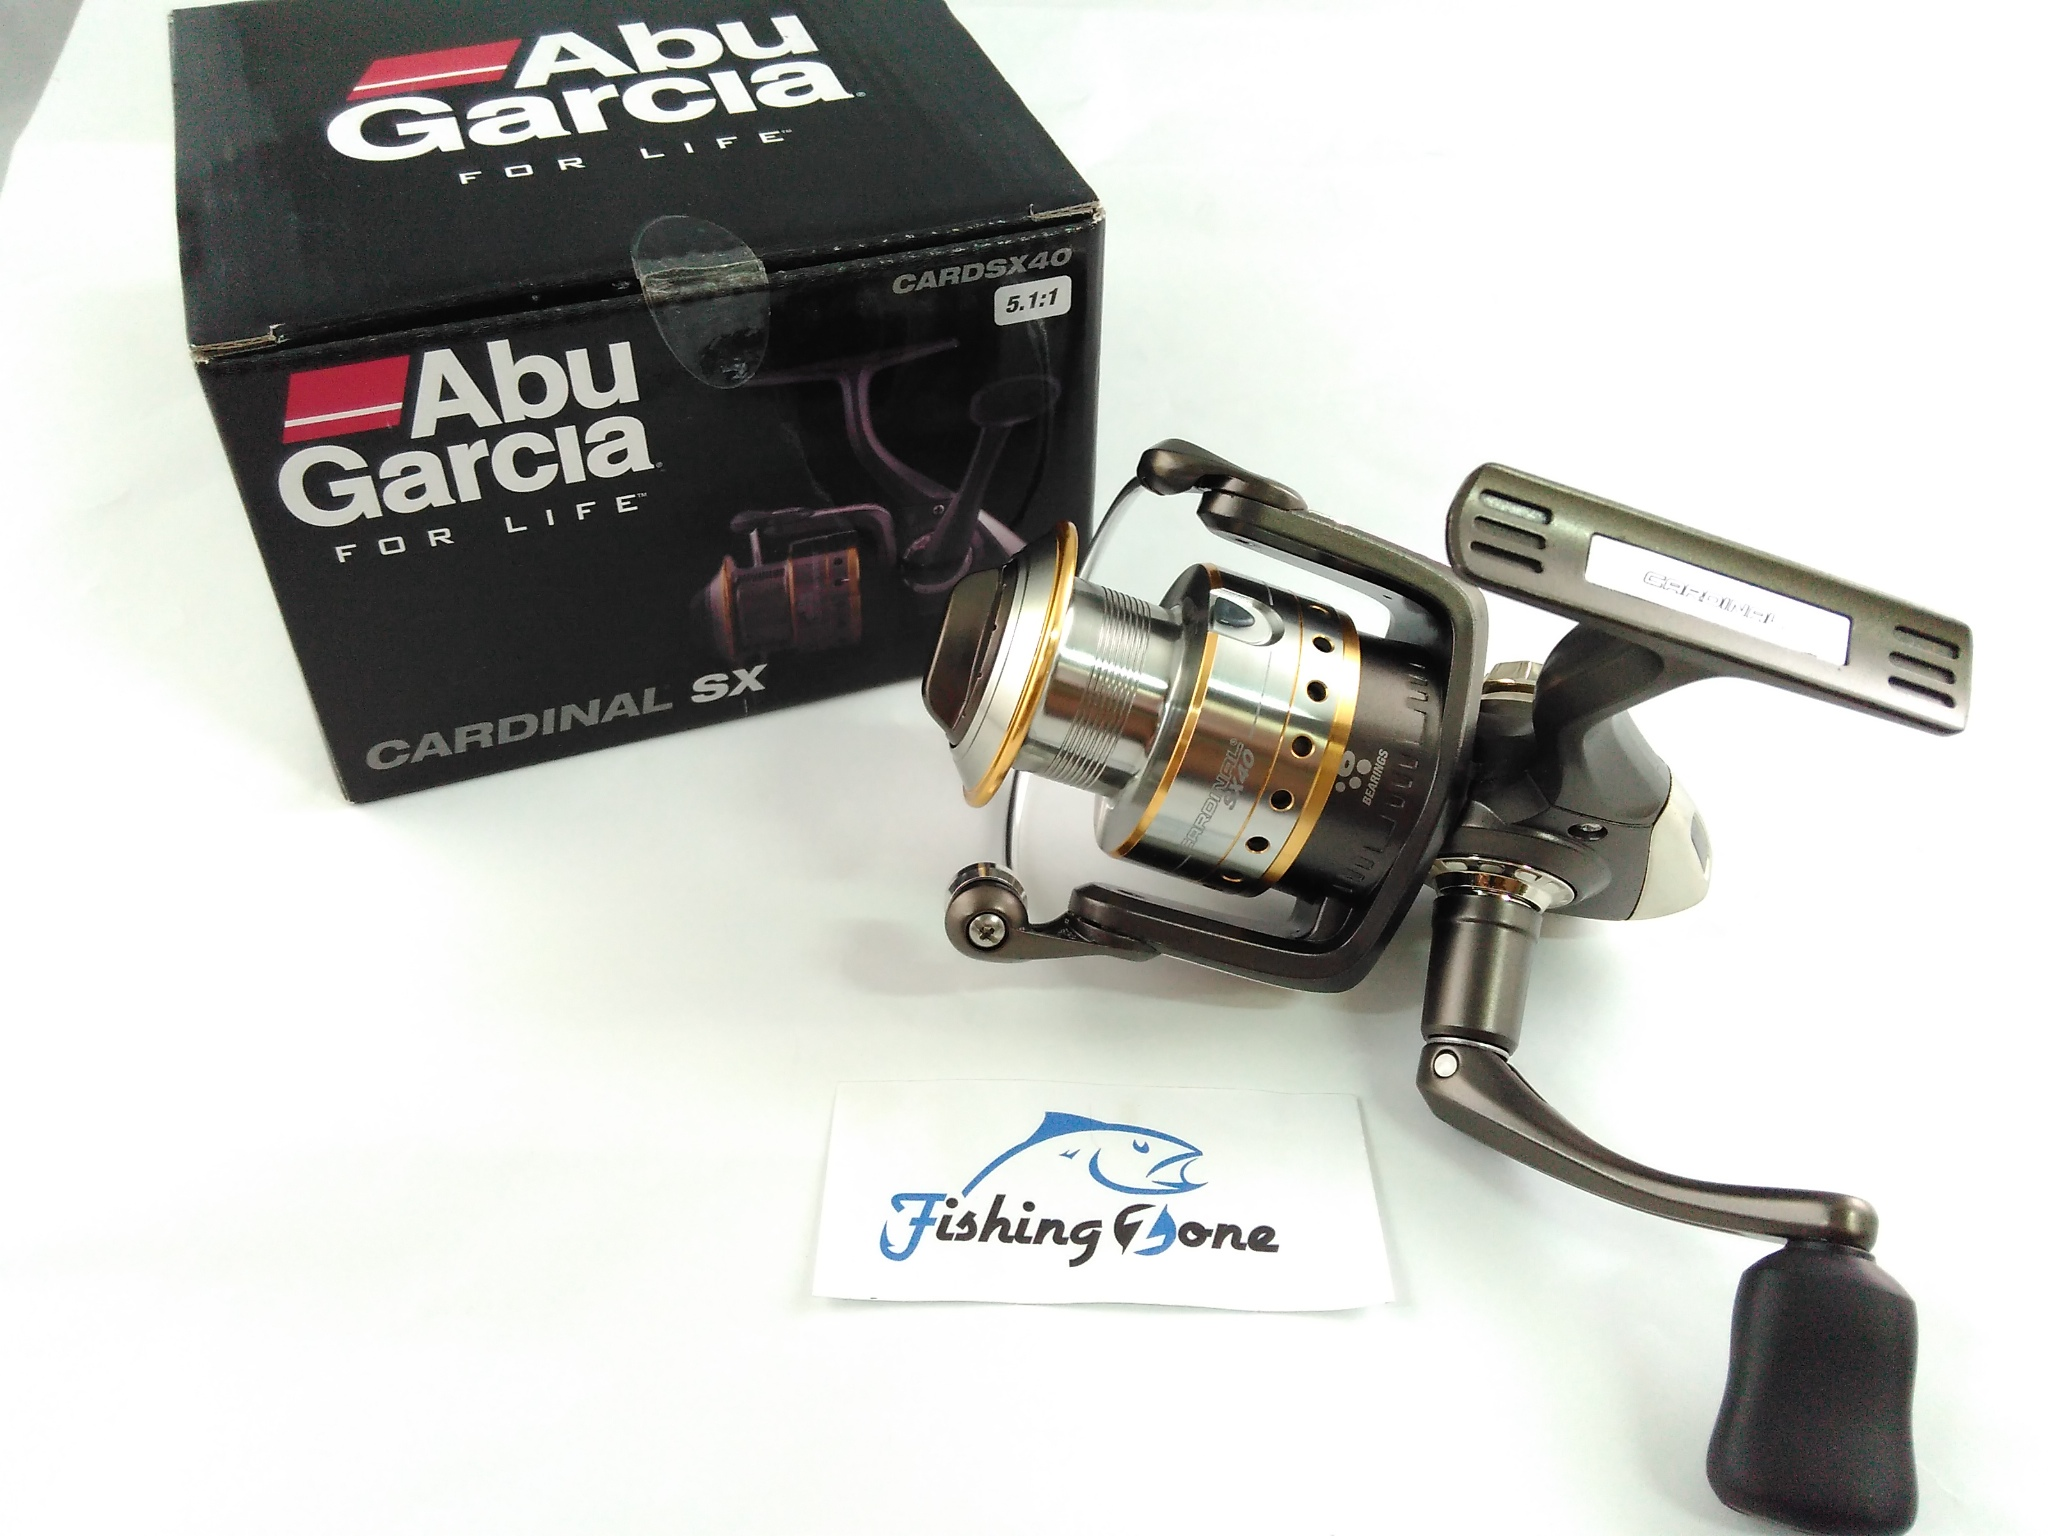 harga Alat Pancing Abu Garcia Cardinal Sx 40 Spinning Reel Blanja.com